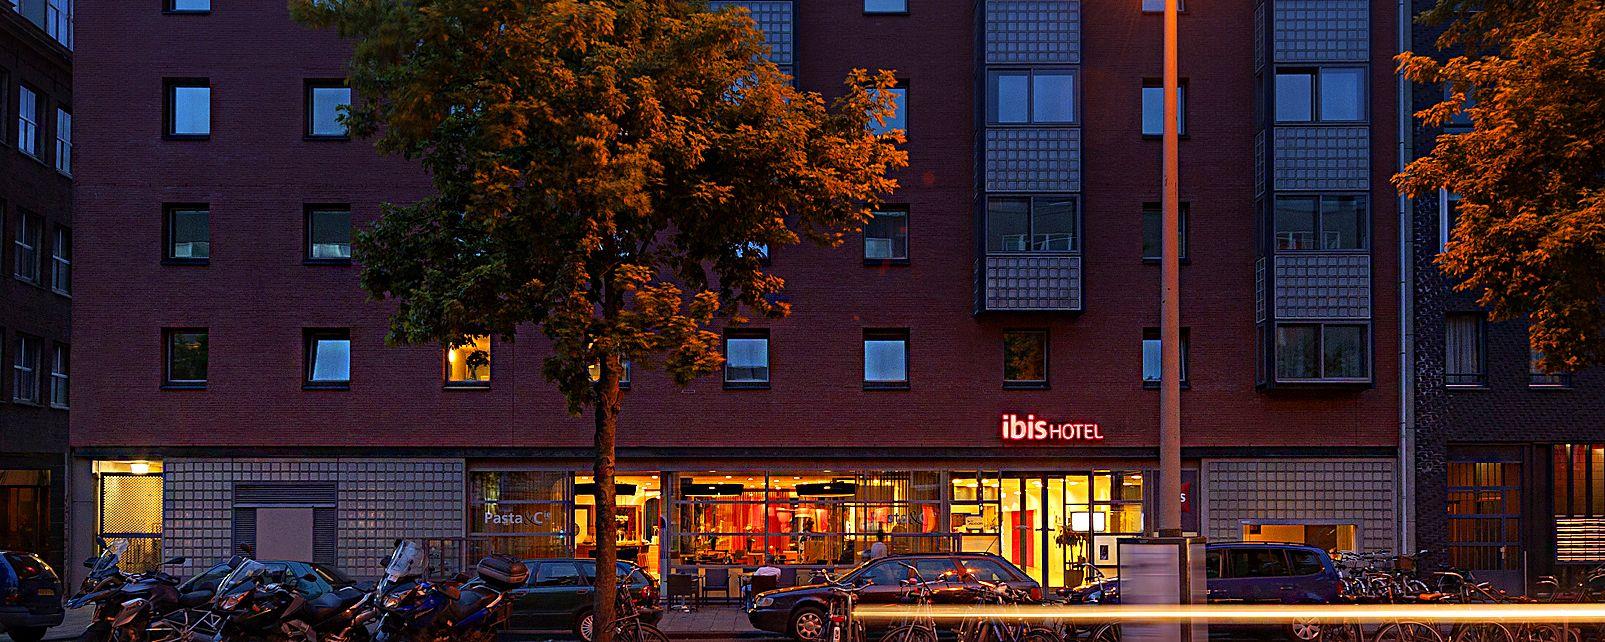 Hotel ibis amsterdam in for Ibis hotel amsterdam